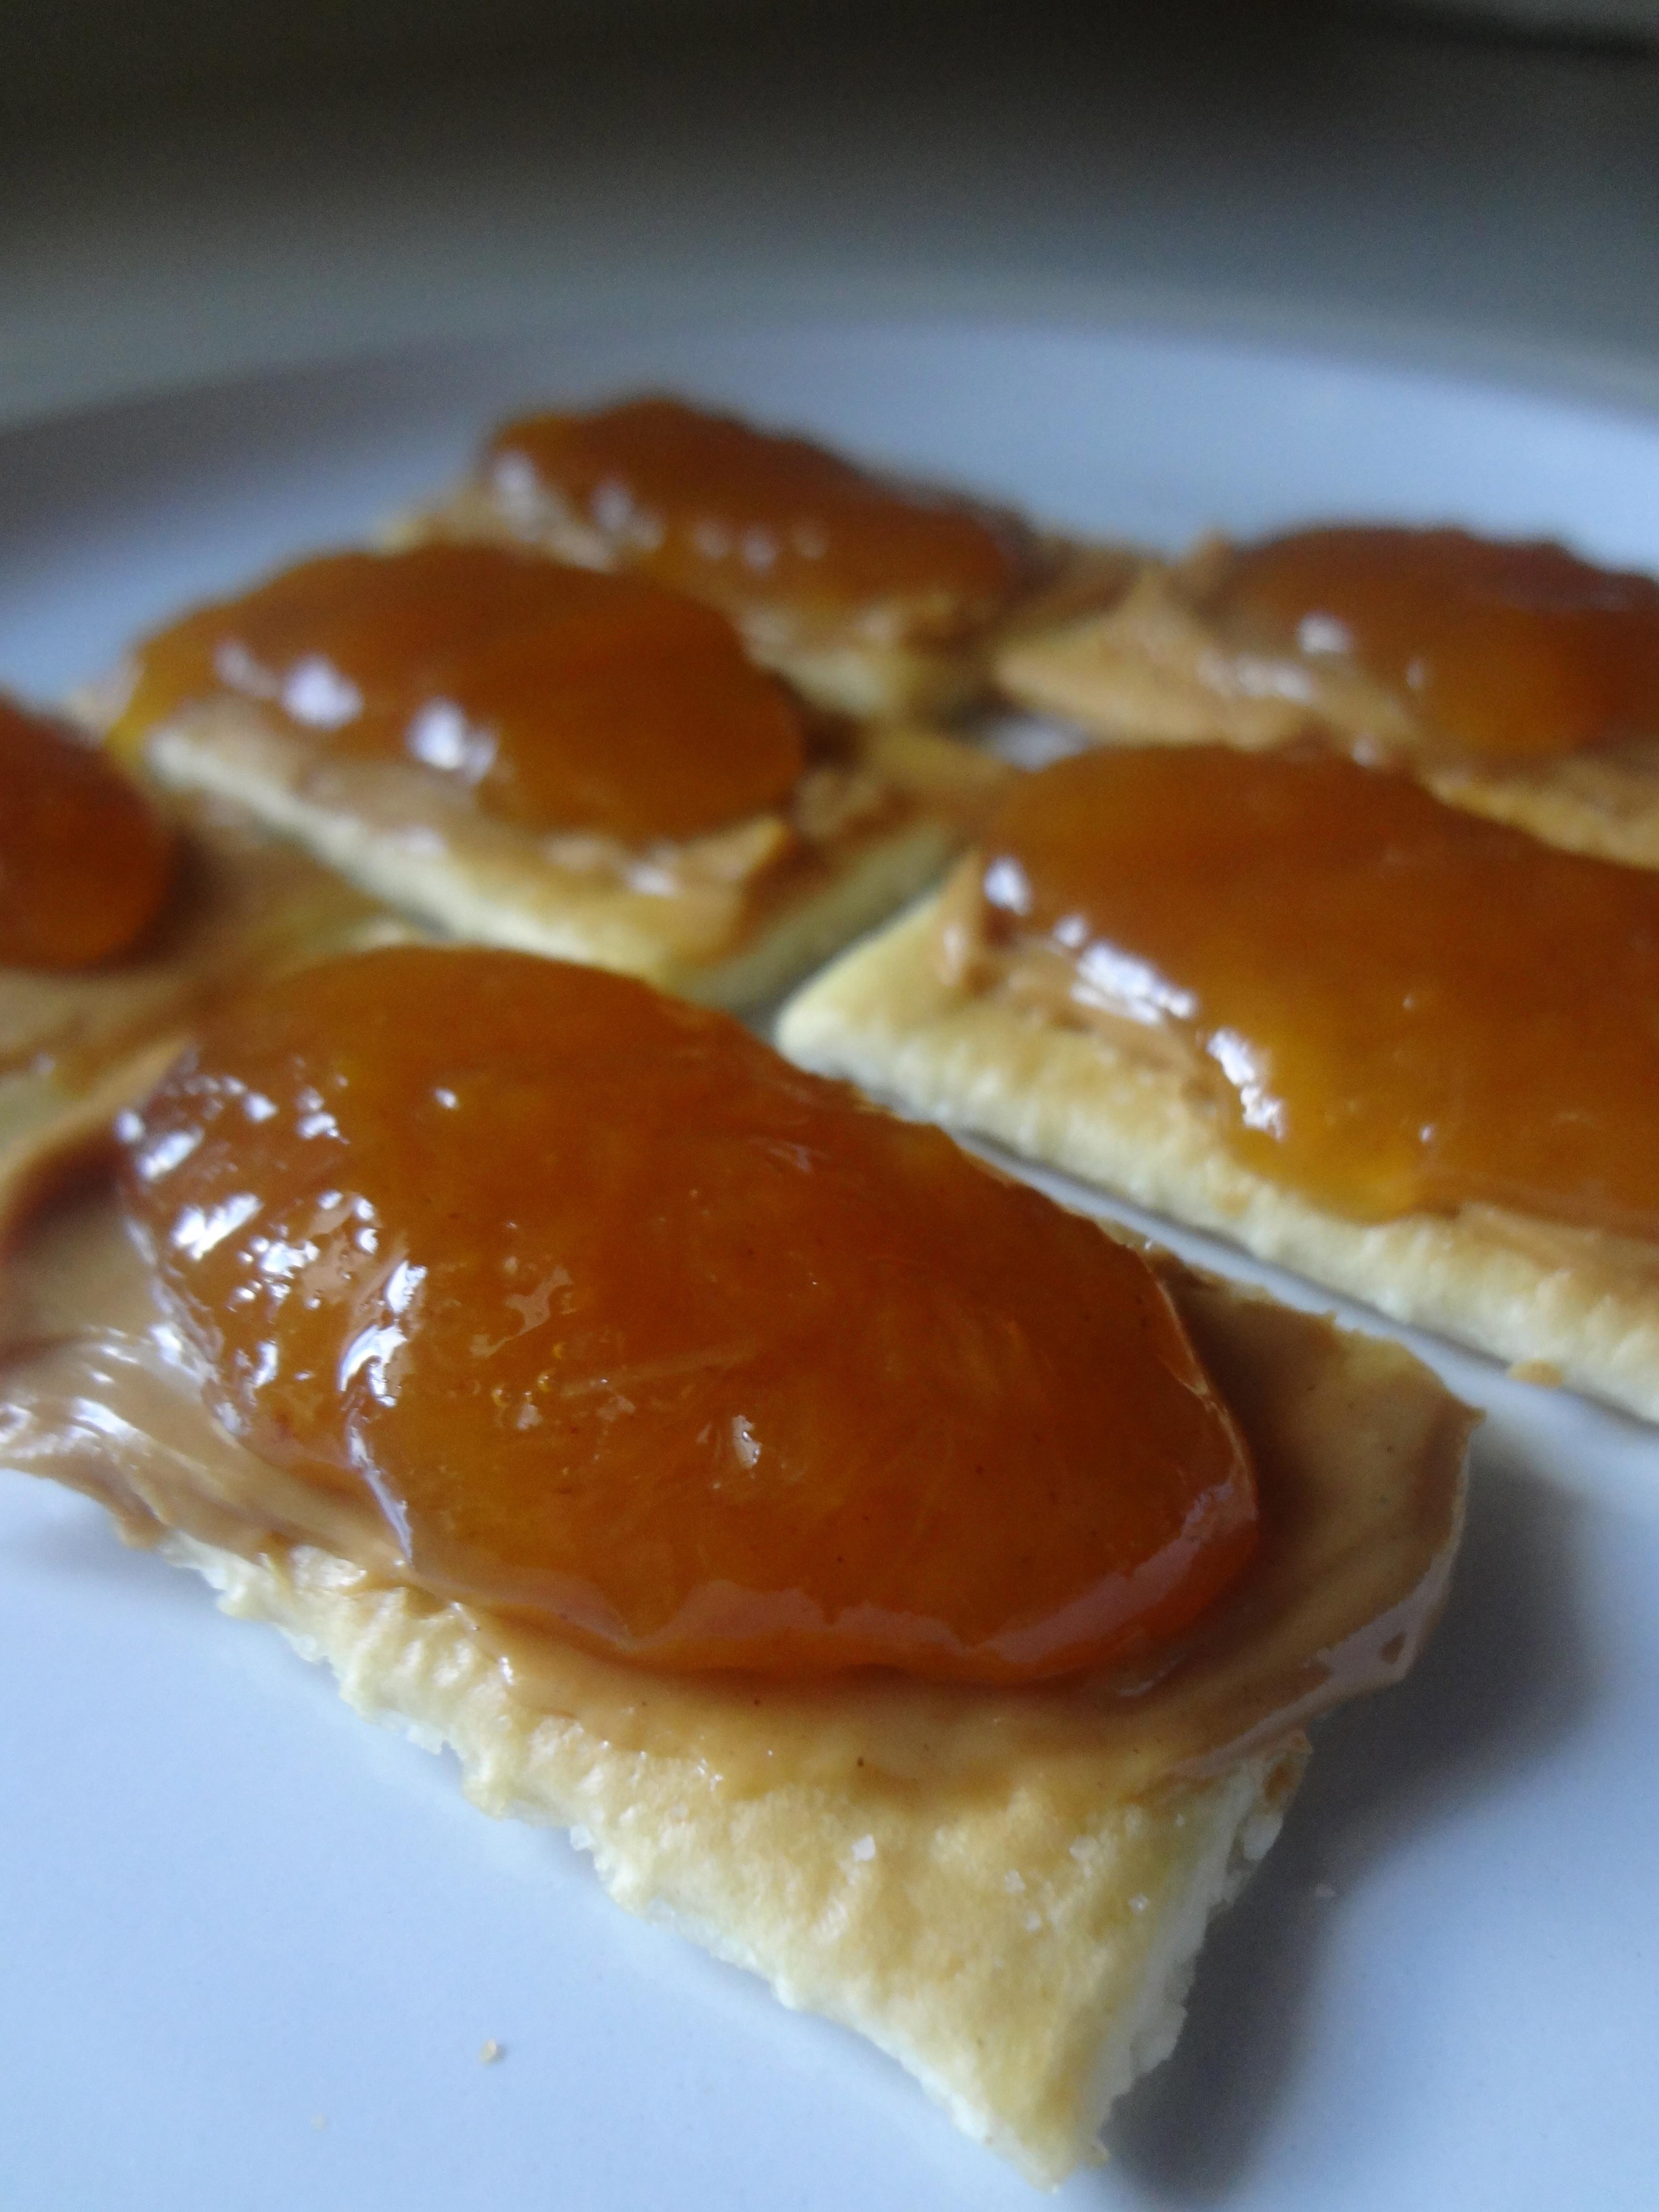 Apple Barn Peach Butter on crackers